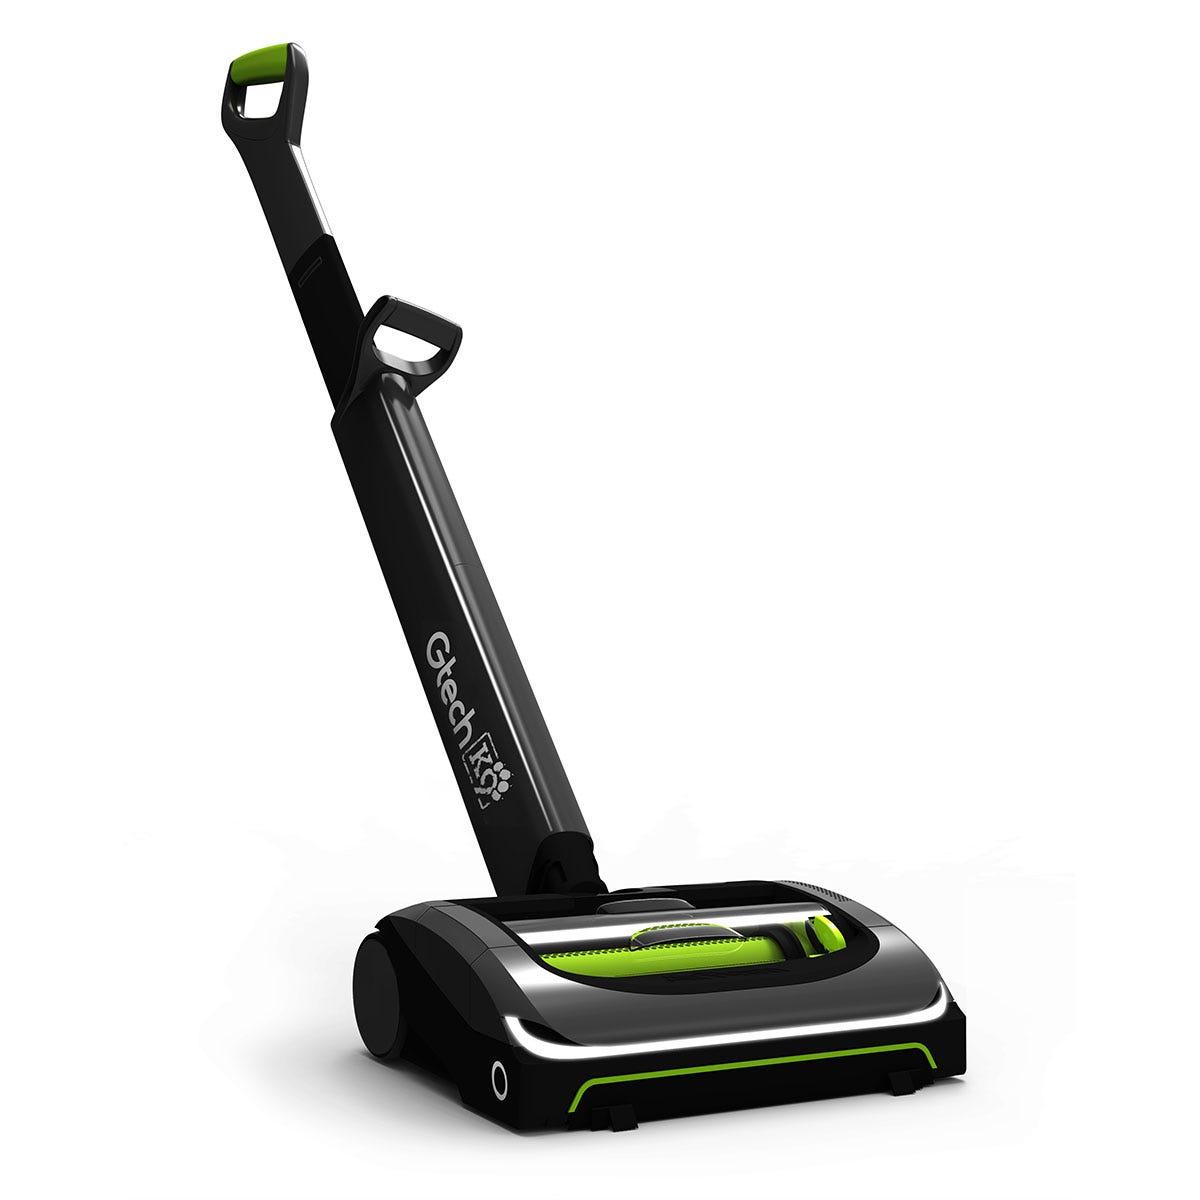 Gtech 1-03-081 AirRam K9 Vacuum Cleaner - Black & Green